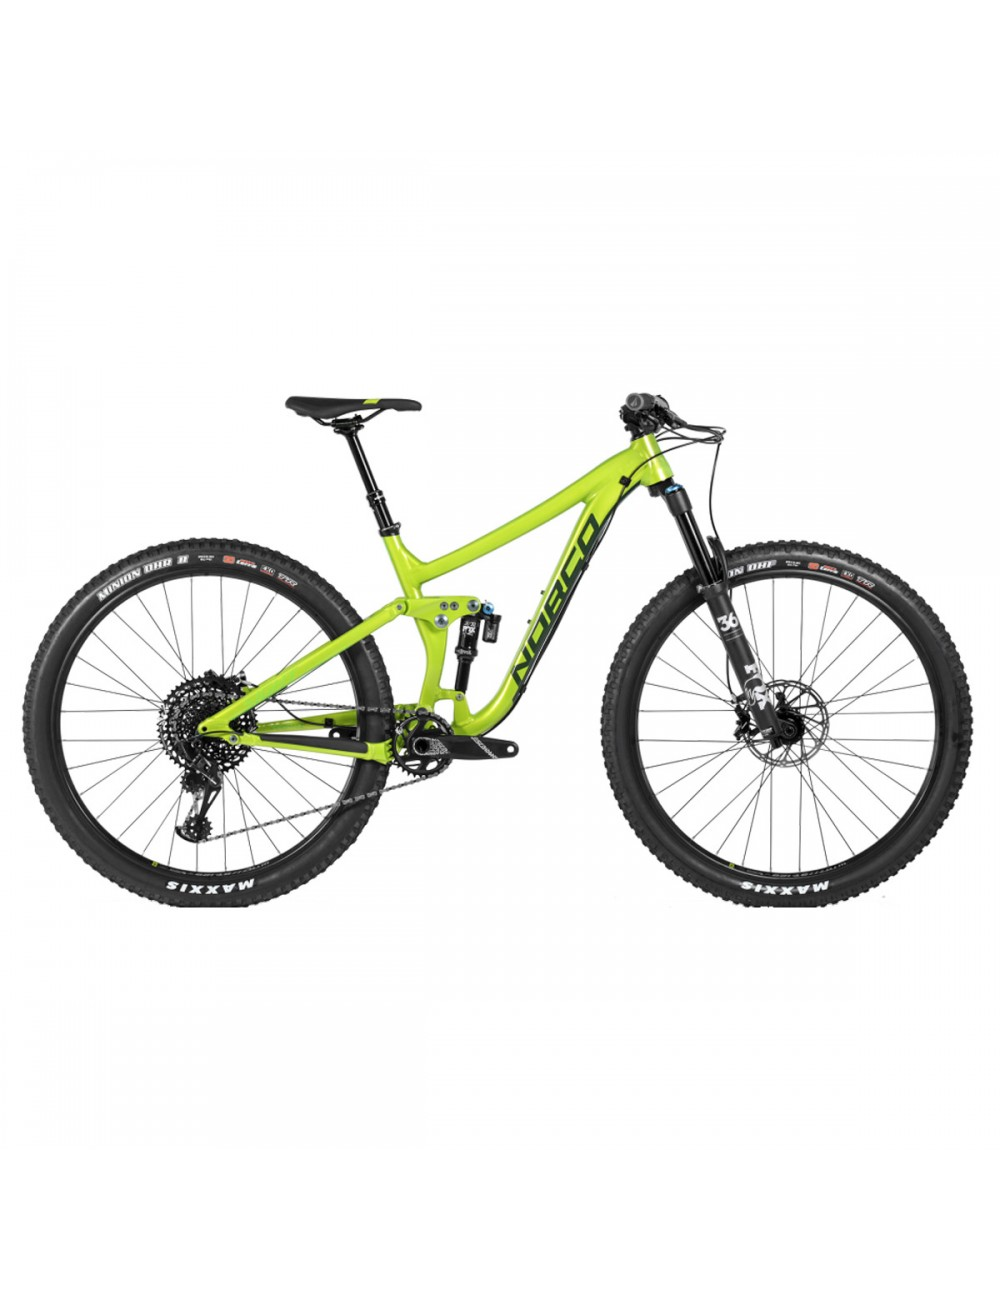 Norco Sight A7.1 Bike Green/Green/Black_1000735